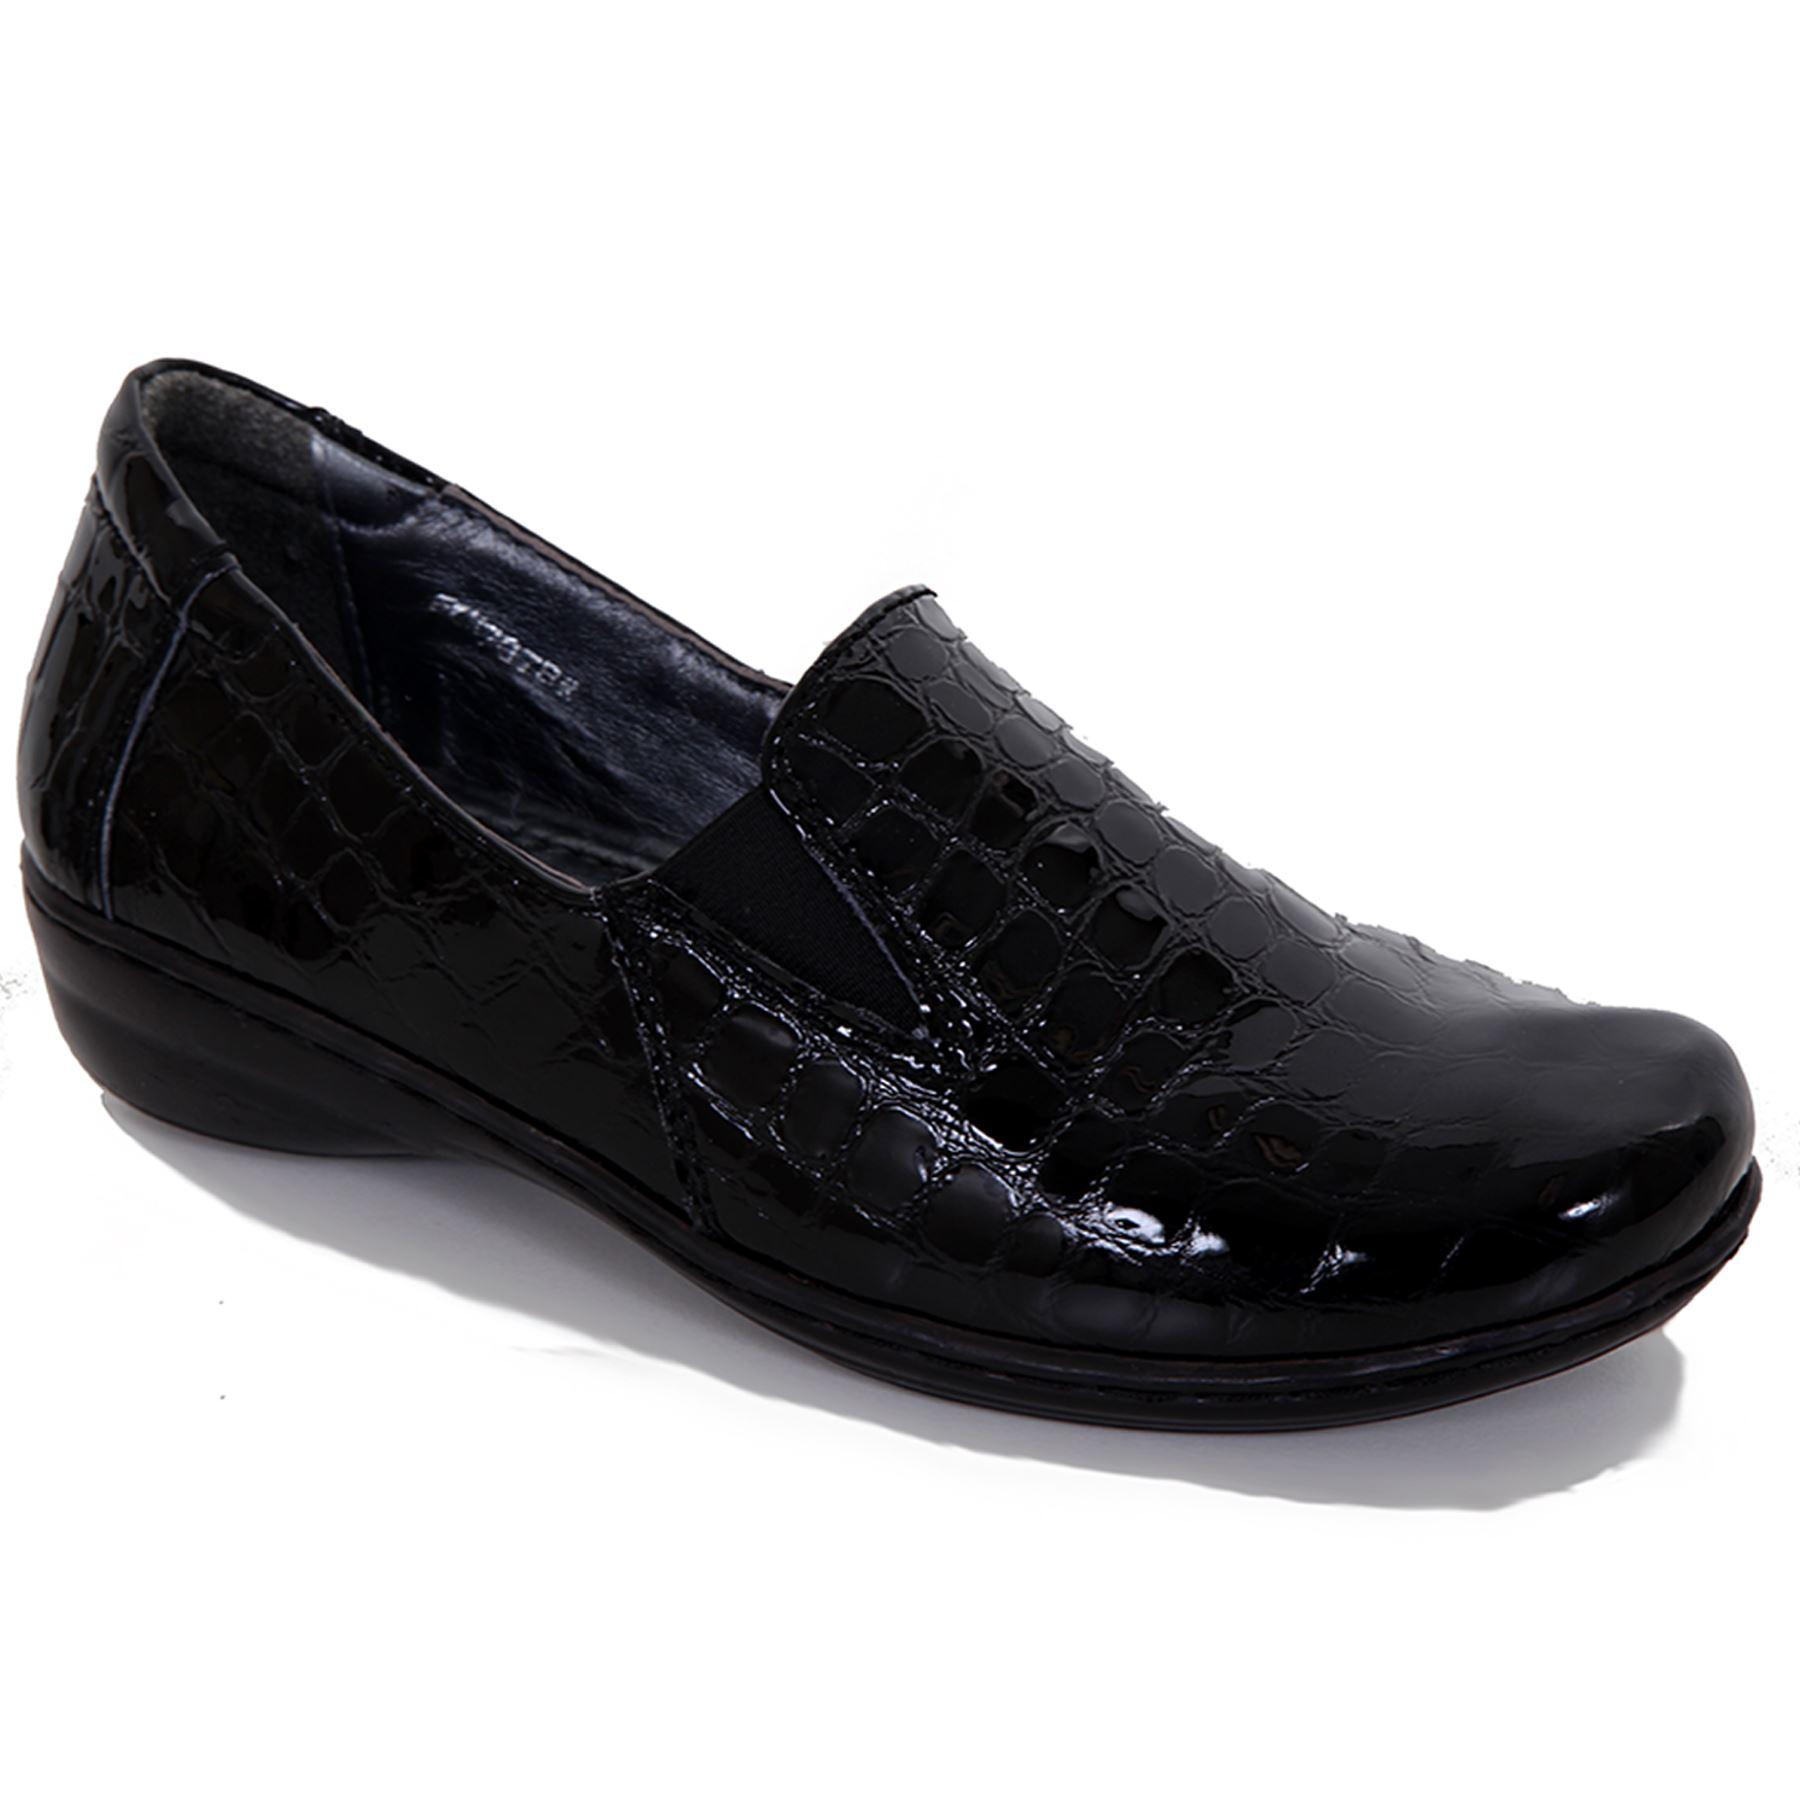 exclusive offer lrg comforter true burgundy womens burgundytrue p white online special iso comfortable vans shoes